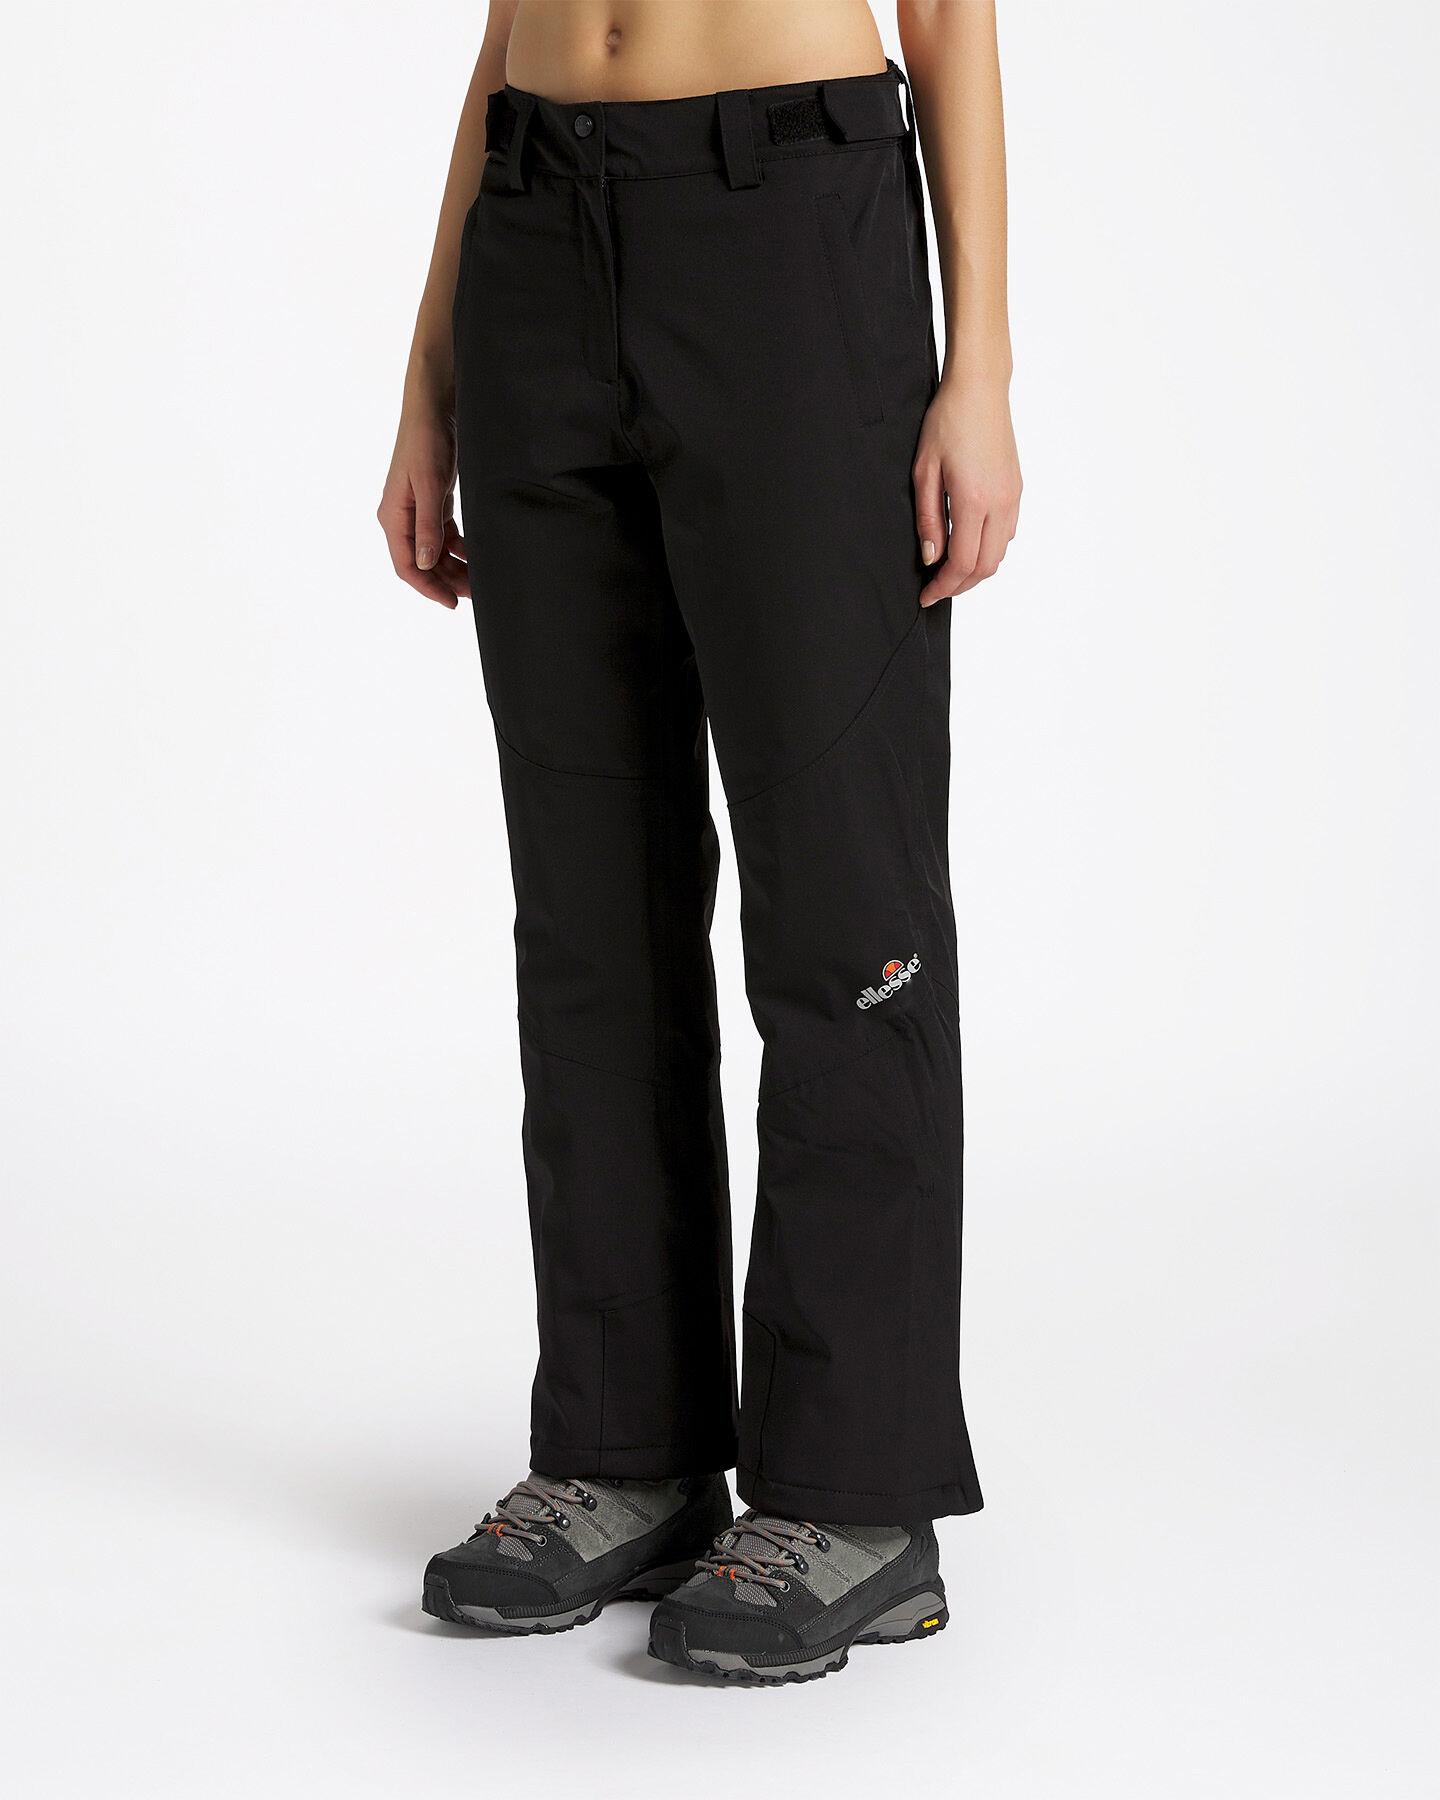 Pantalone sci ELLESSE SKI PANT W S4029977 scatto 2